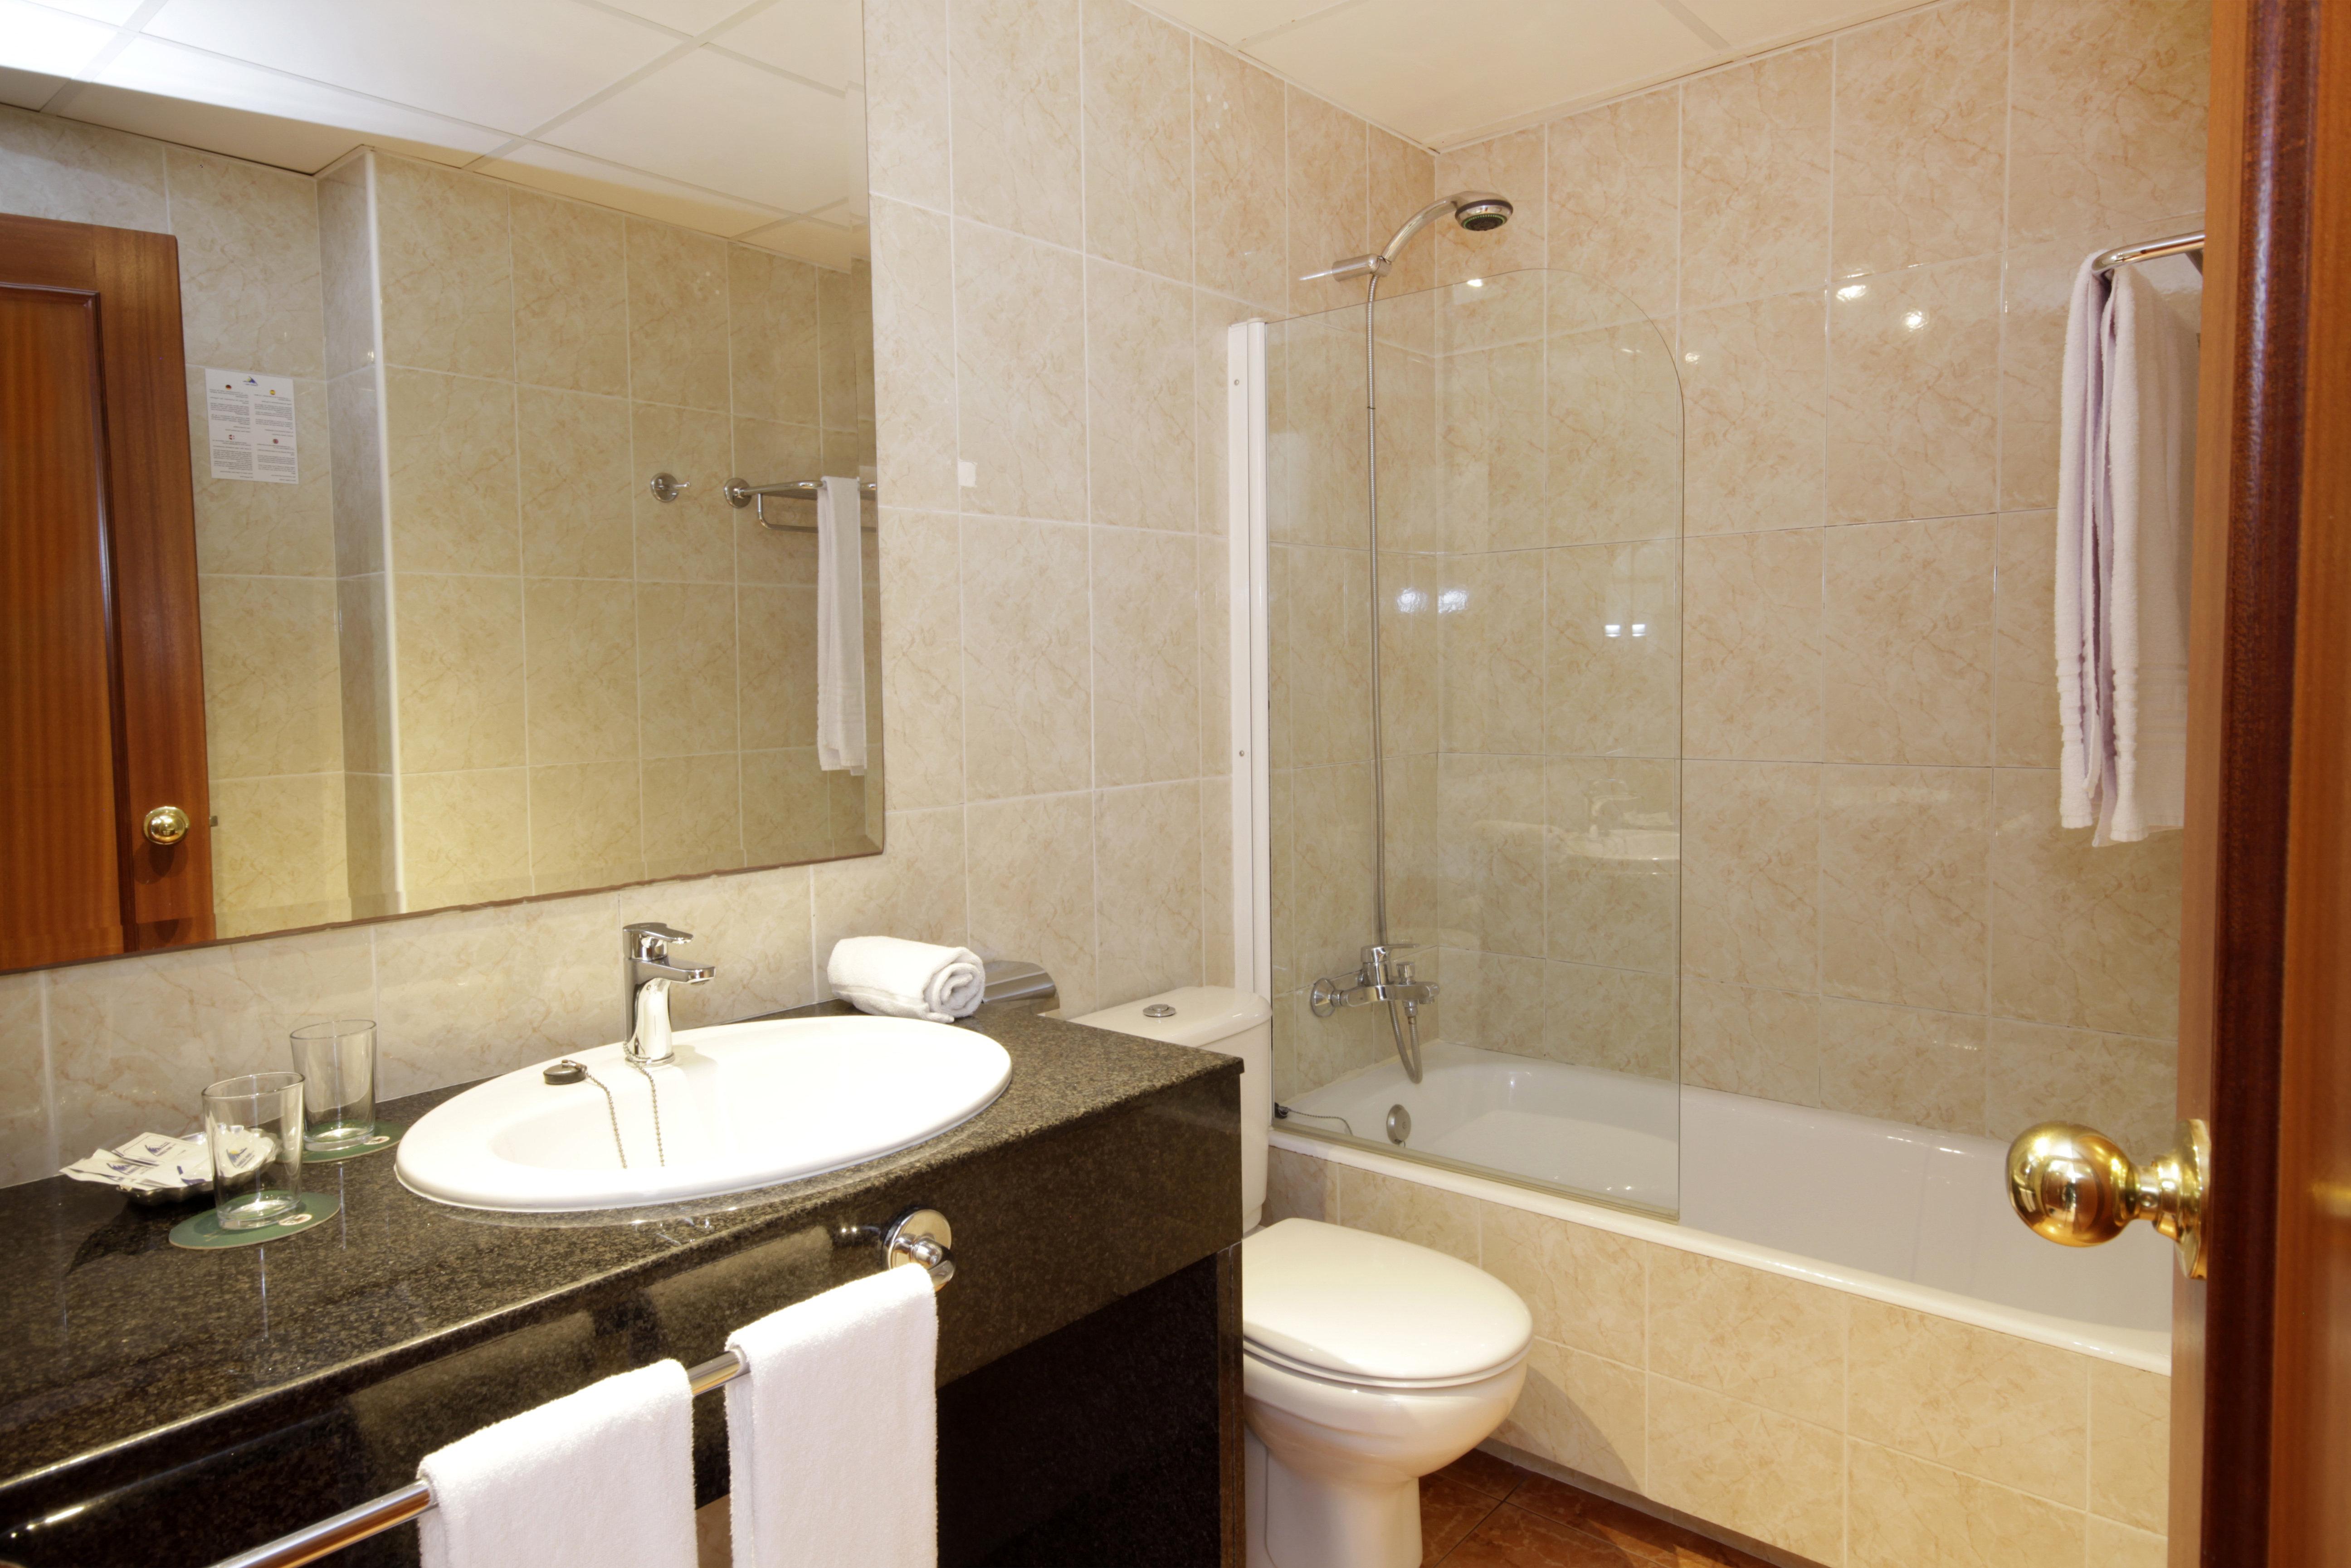 hotel ilusion markus park & spa - santa margalida – great prices, Badezimmer ideen